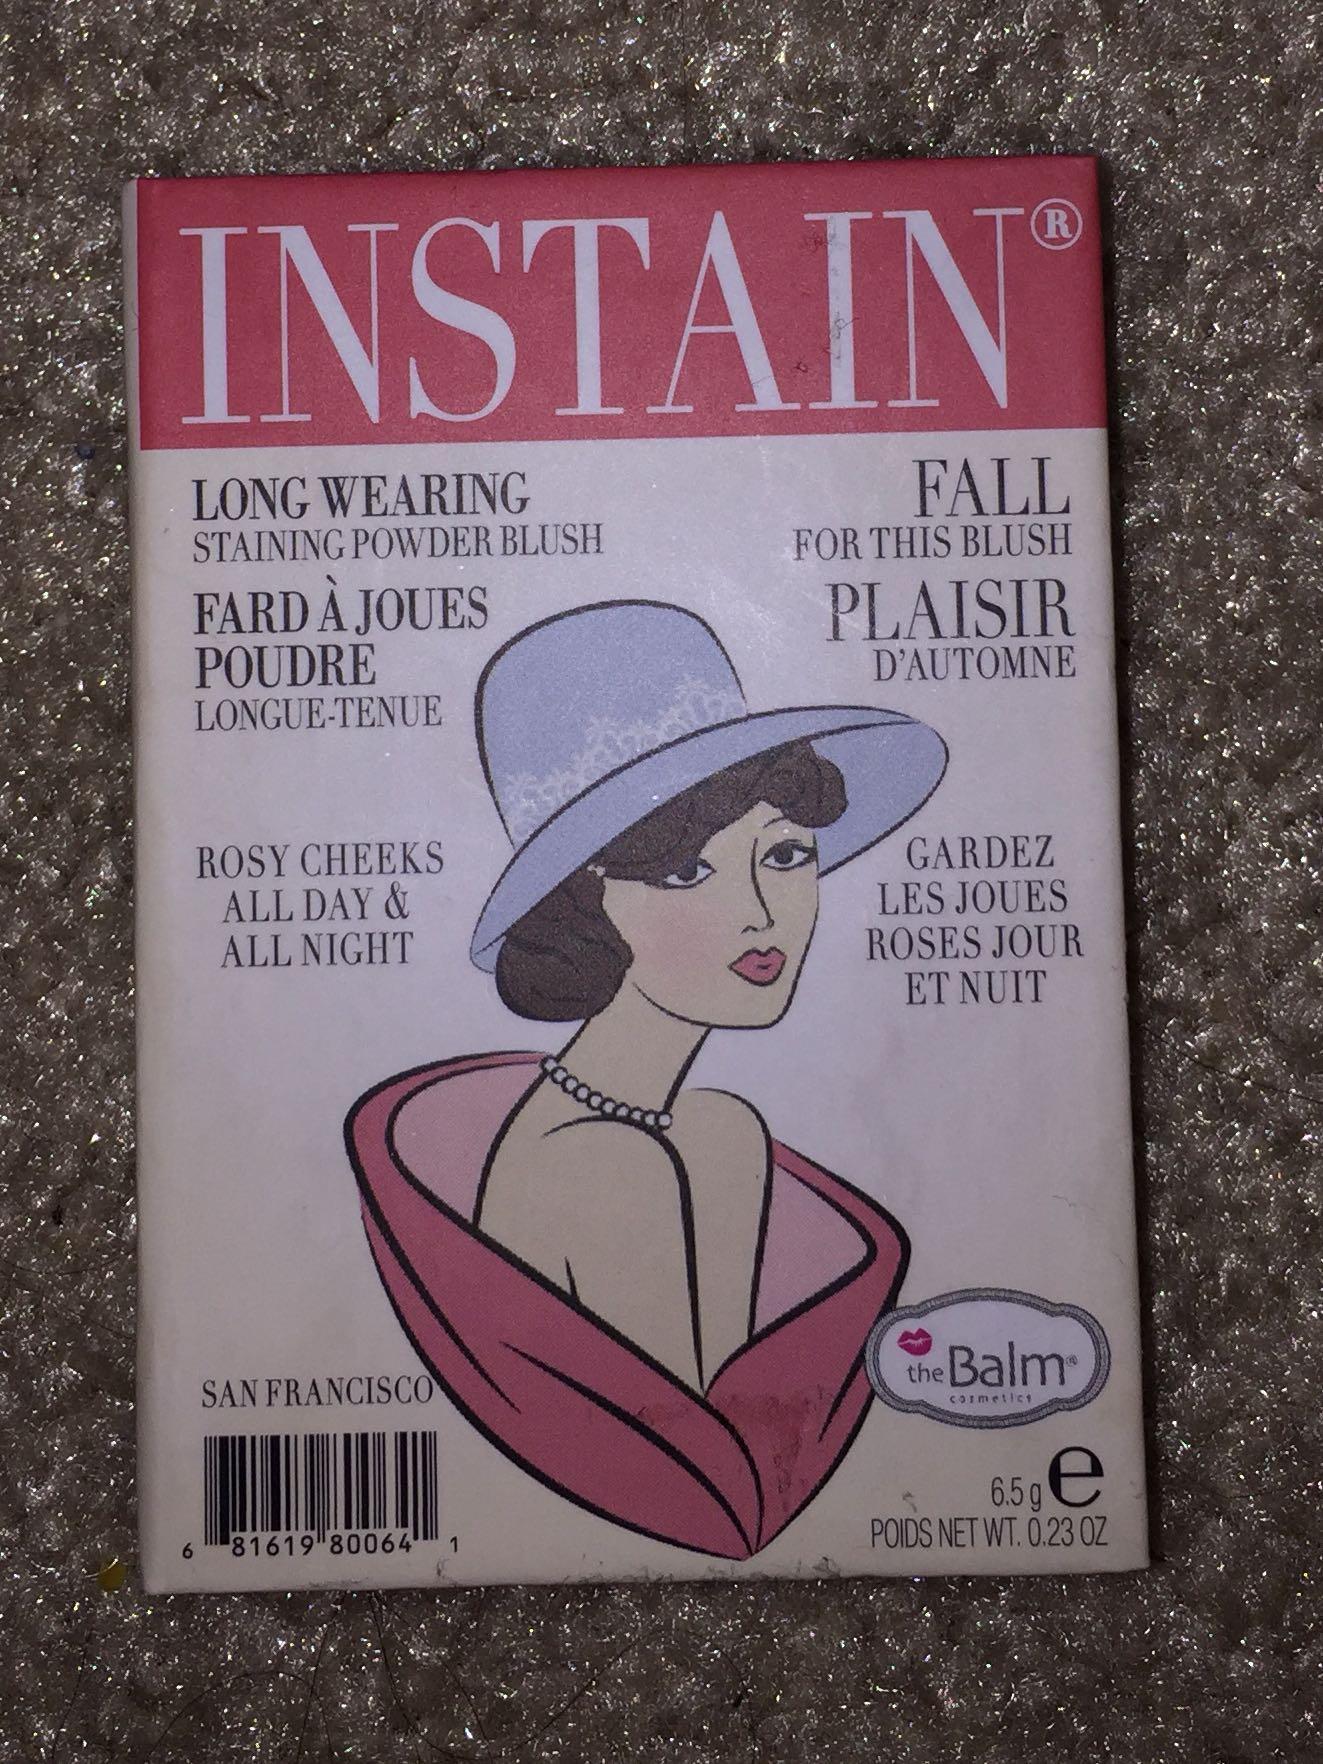 The Balm Instain Blush